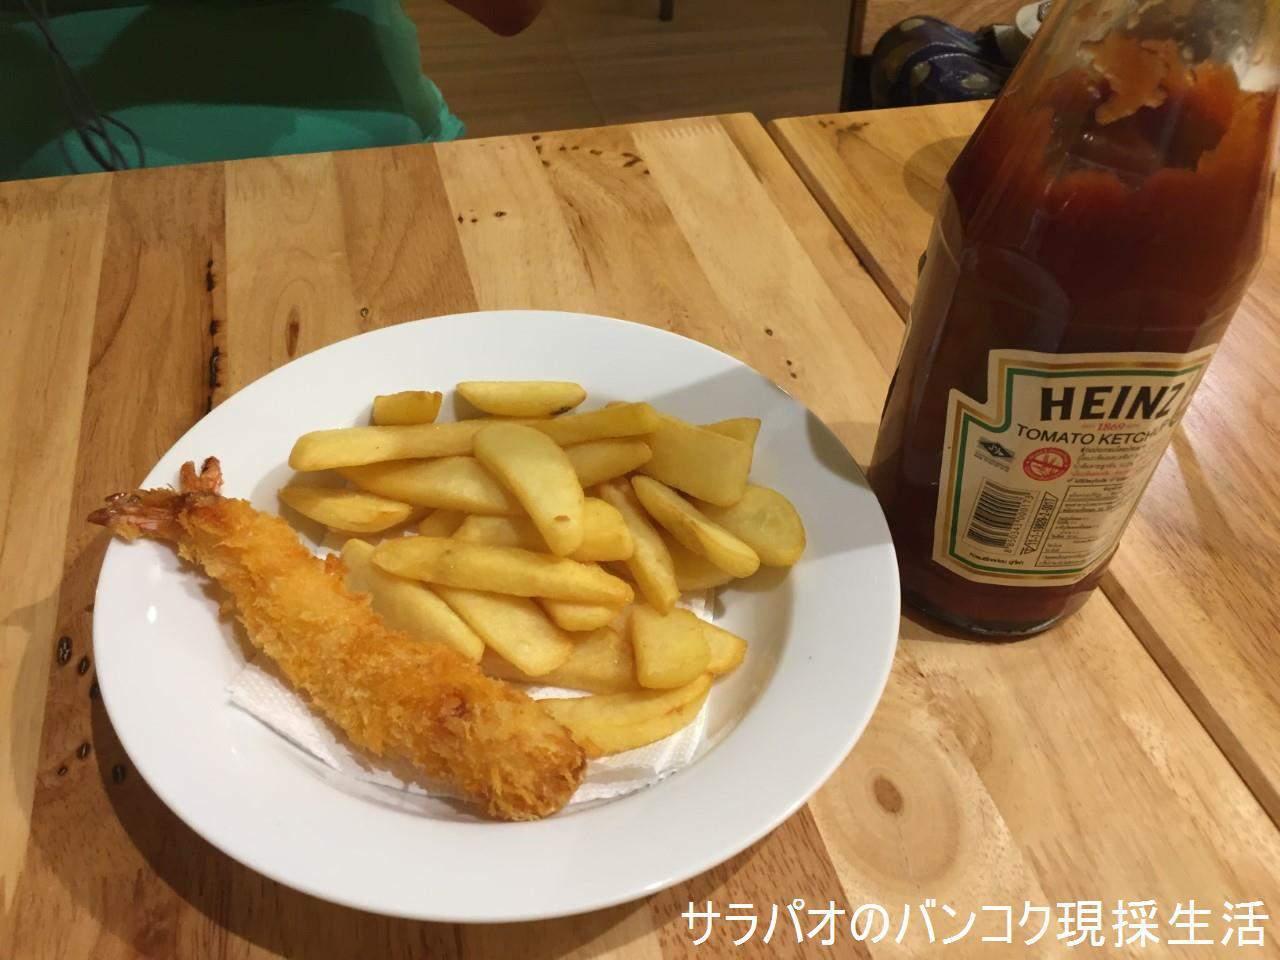 CurryShogun_15.jpg